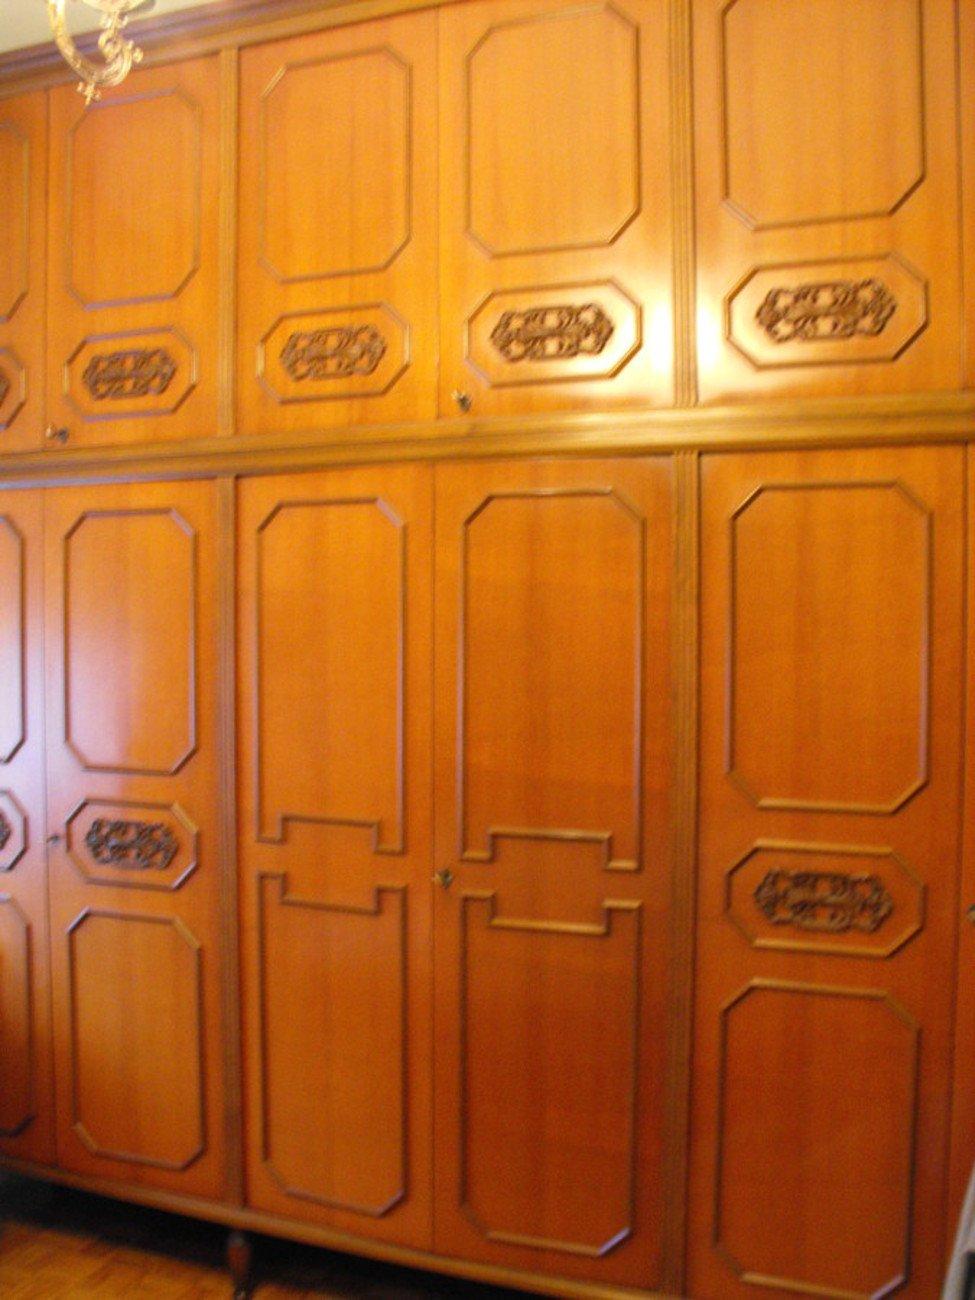 Restyling trasformare un vecchio armadio in un arredo - Decorare un armadio ...